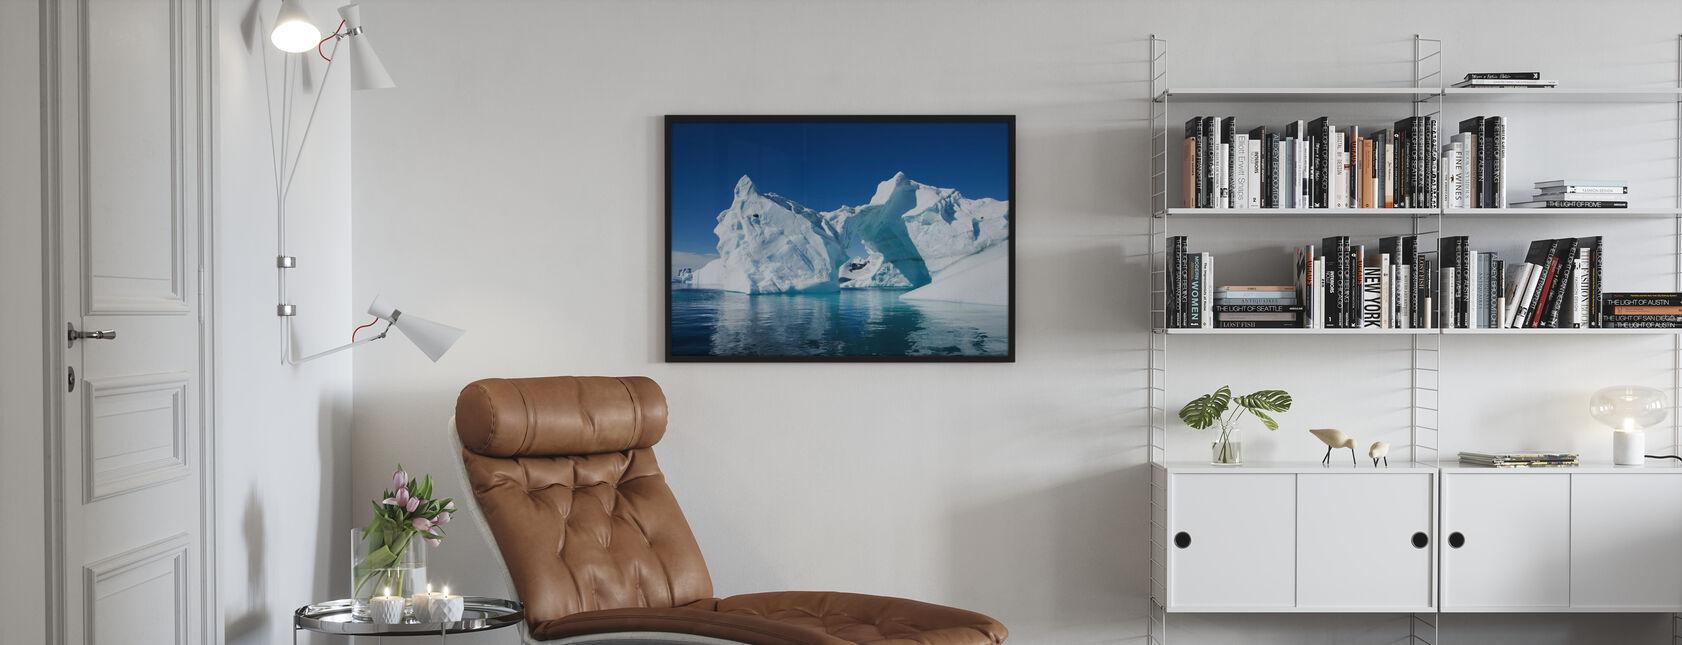 Iceberg Antarctica - Poster - Living Room